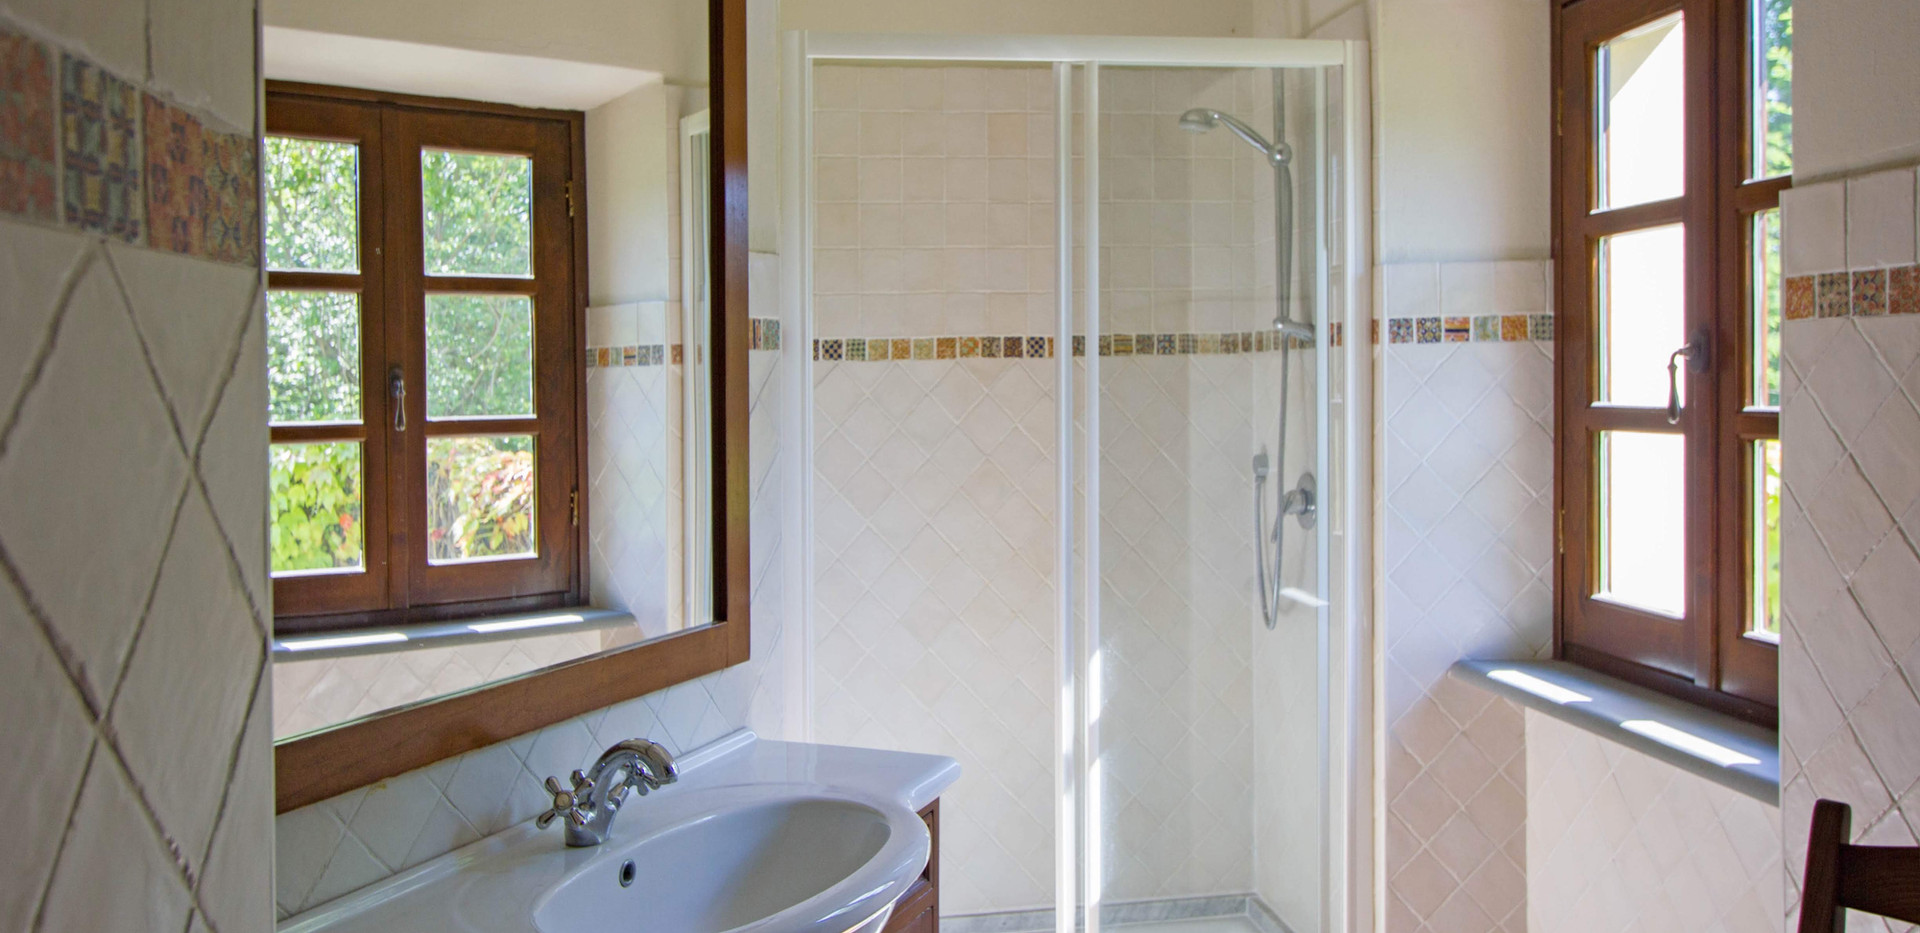 Master bedroom bathroom Home 2.jpg